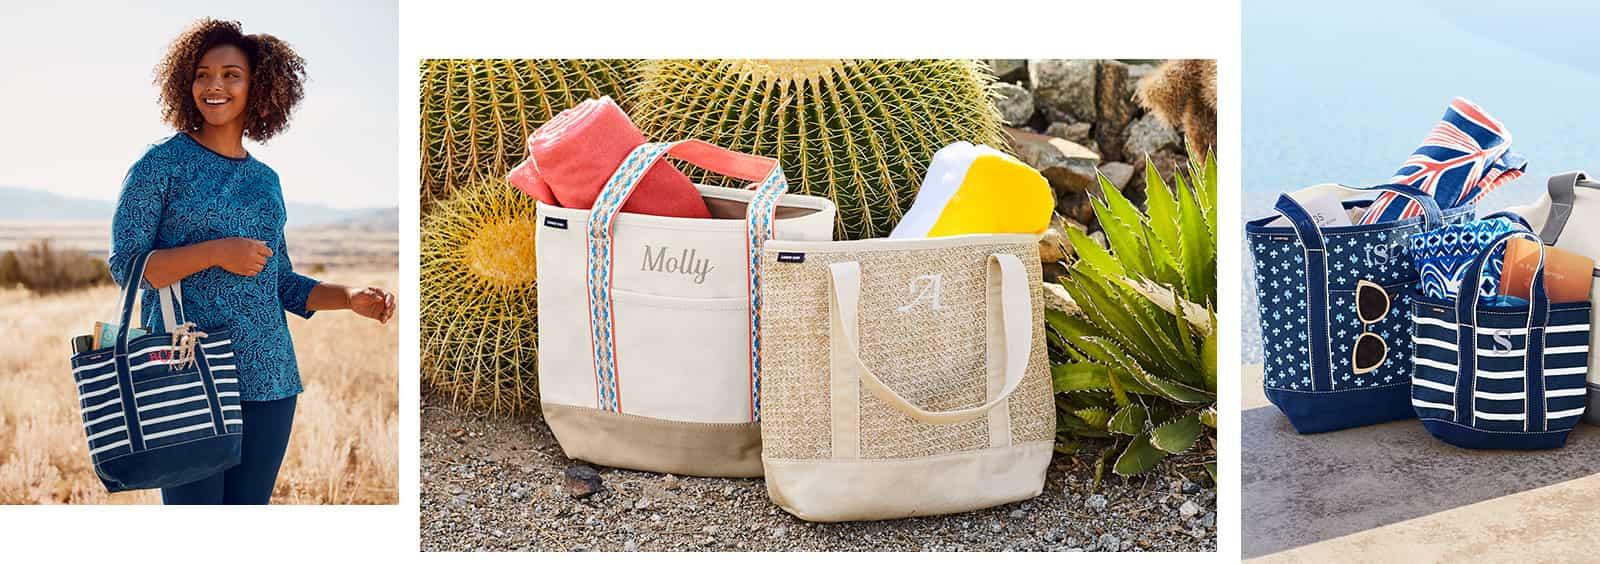 5 Travel Bag Essentials You Should Never Forget